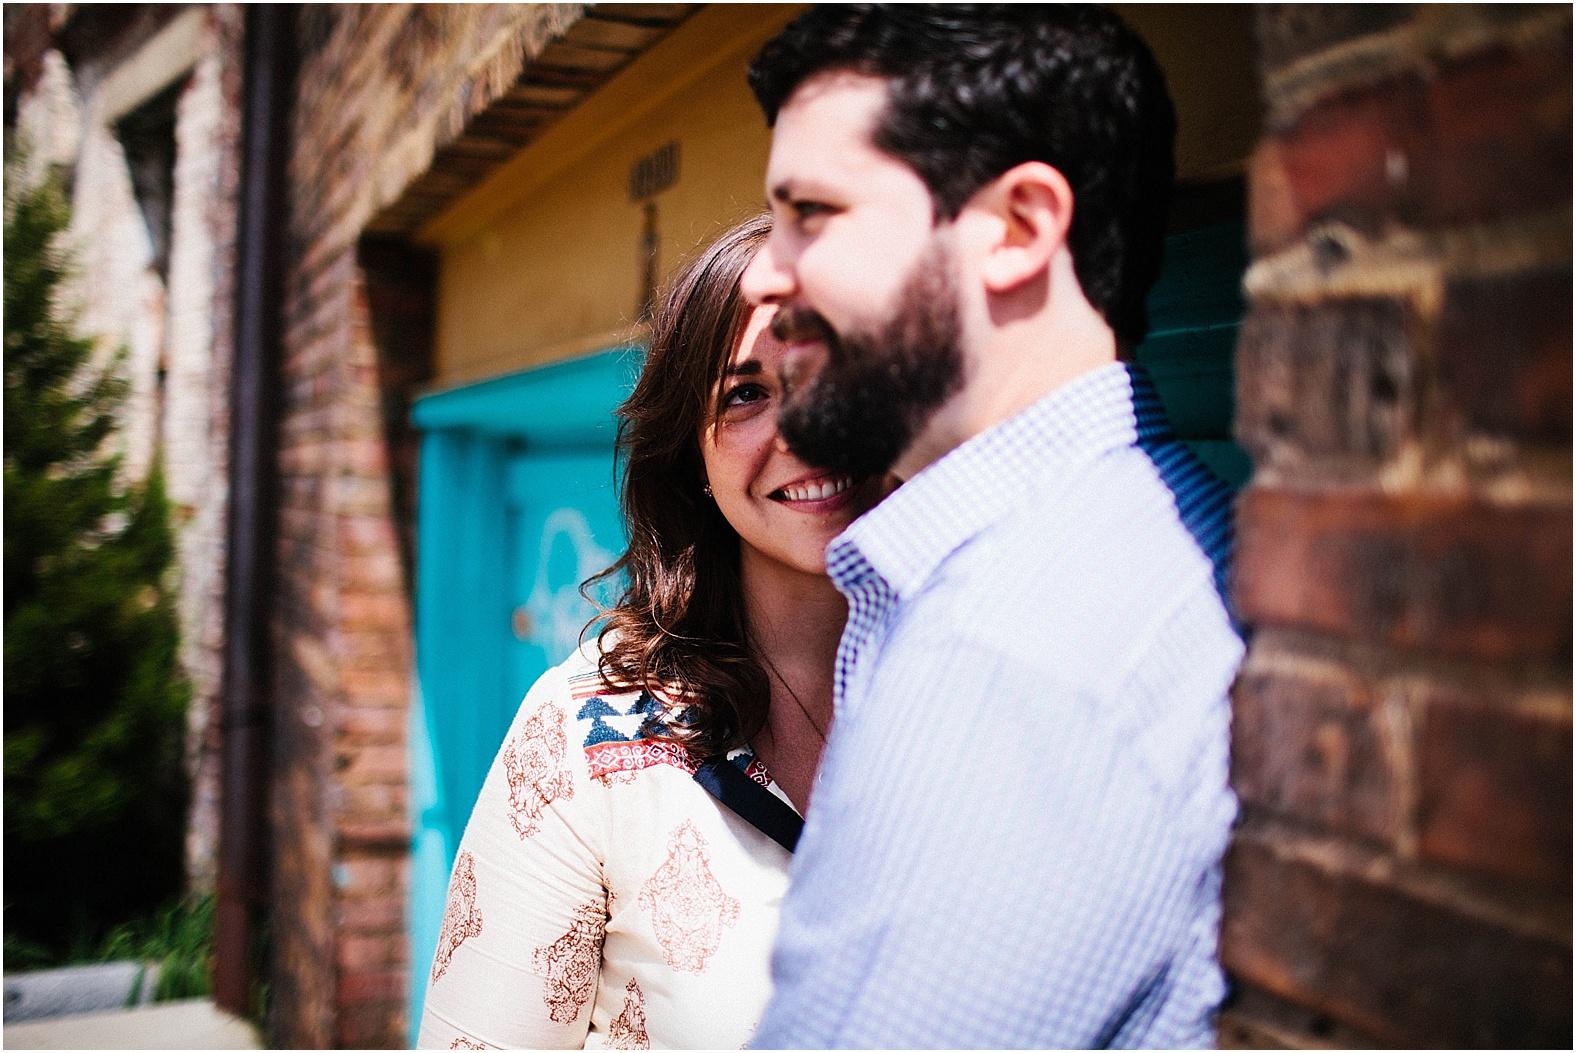 manzanita photo by rebecca caridad internation wedding photogrpaher, colorado wedding photographer, nashville wedding photographer_0448.jpg